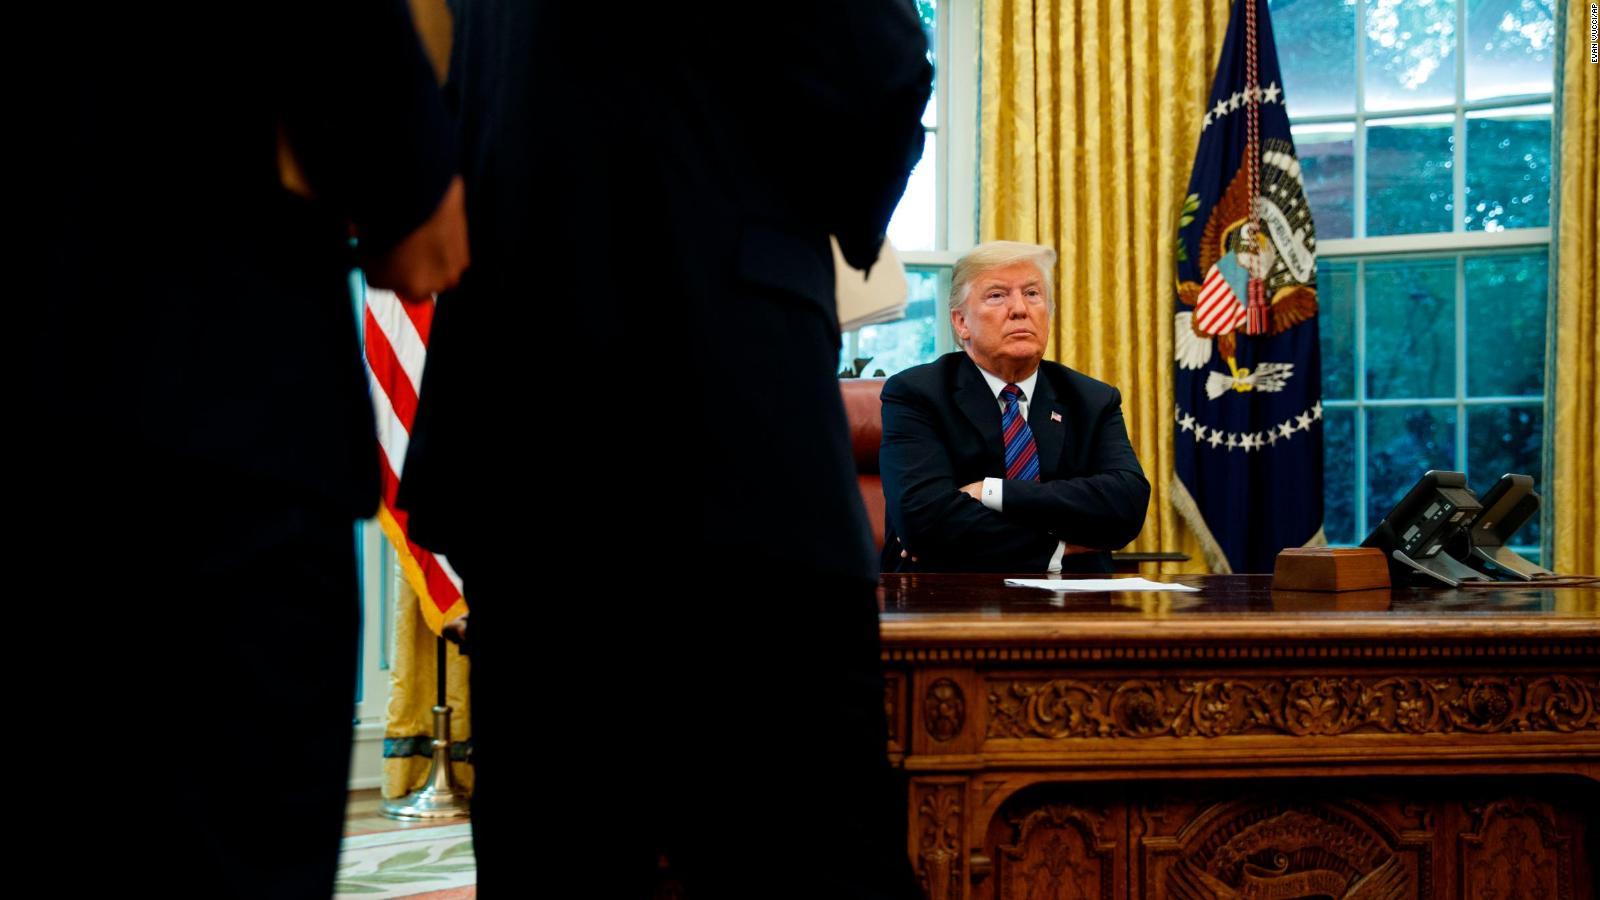 El dilema de Trump con Irán: ¿operación militar o seguir con la presión diplomática?